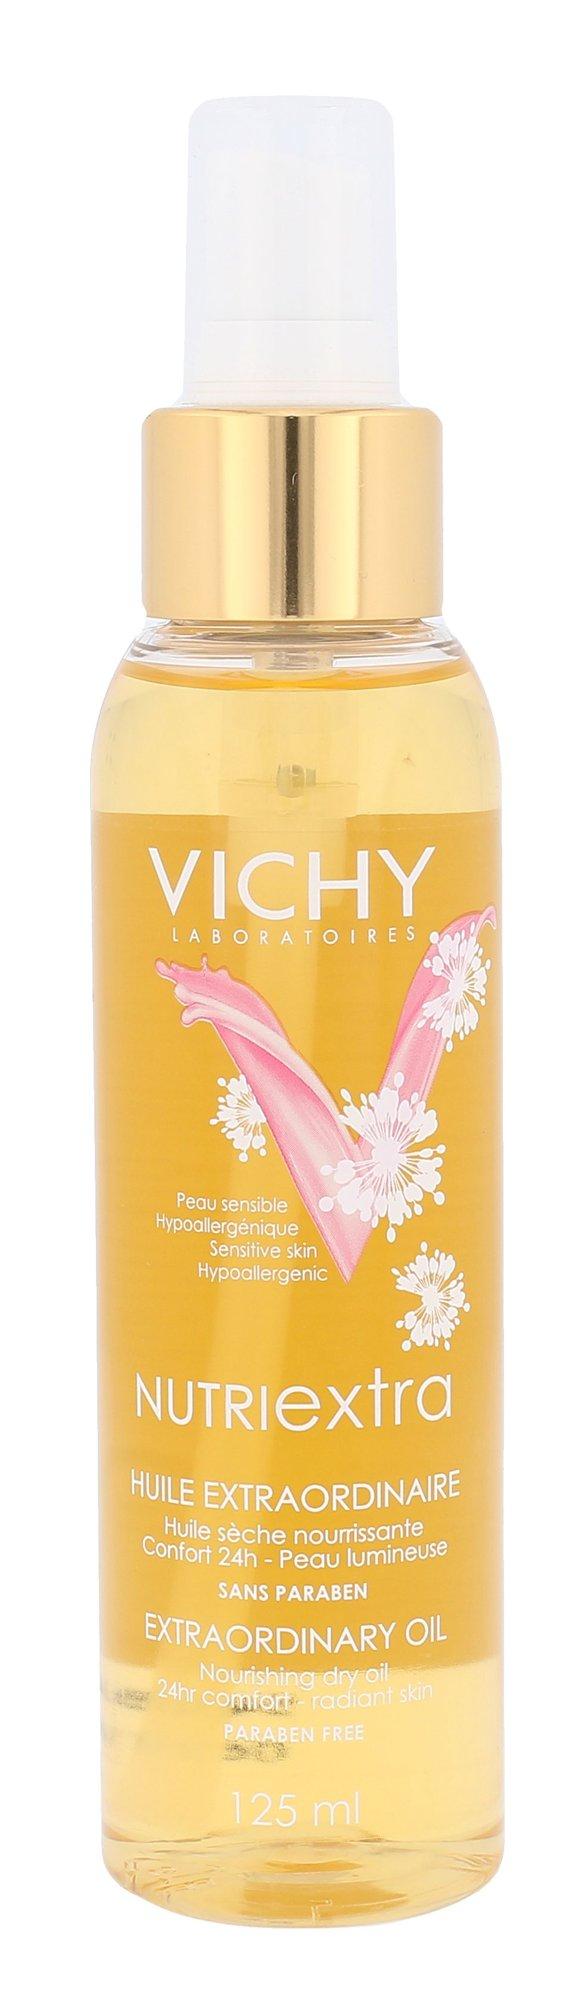 Vichy Nutriextra Cosmetic 125ml